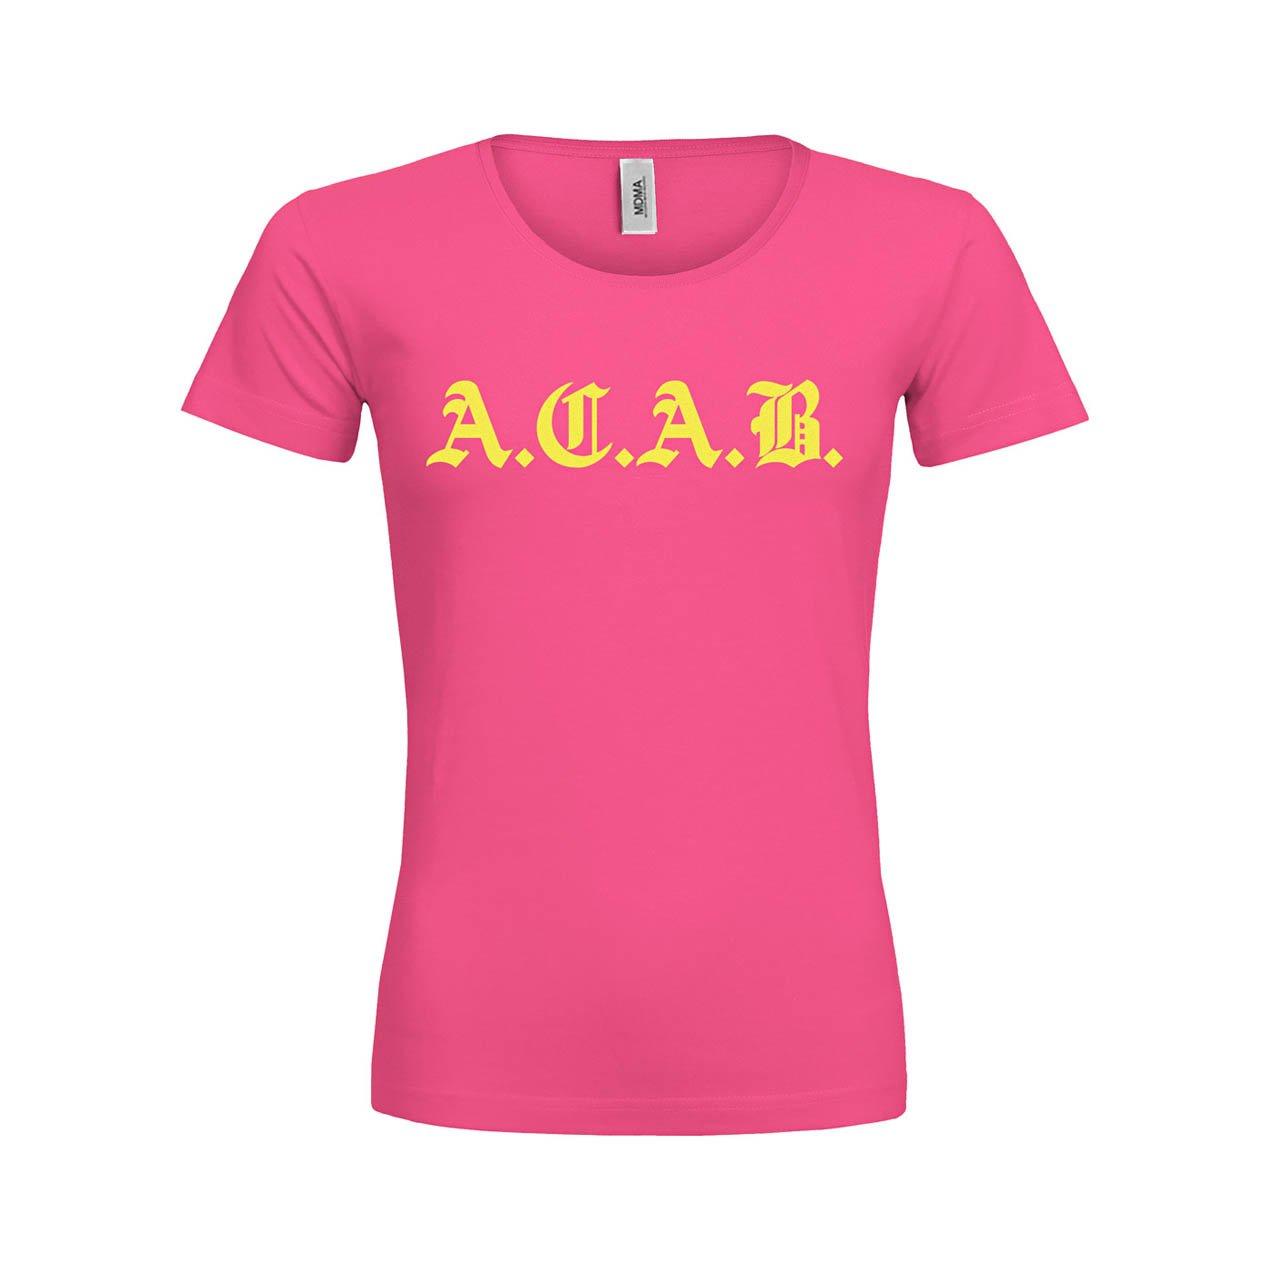 709ea670b97319 MerchanDise Market Association UG MDMA Frauen Premium T-Shirt A.C.A.B M  MDMA mdma-ftp00313-93 Textil ...